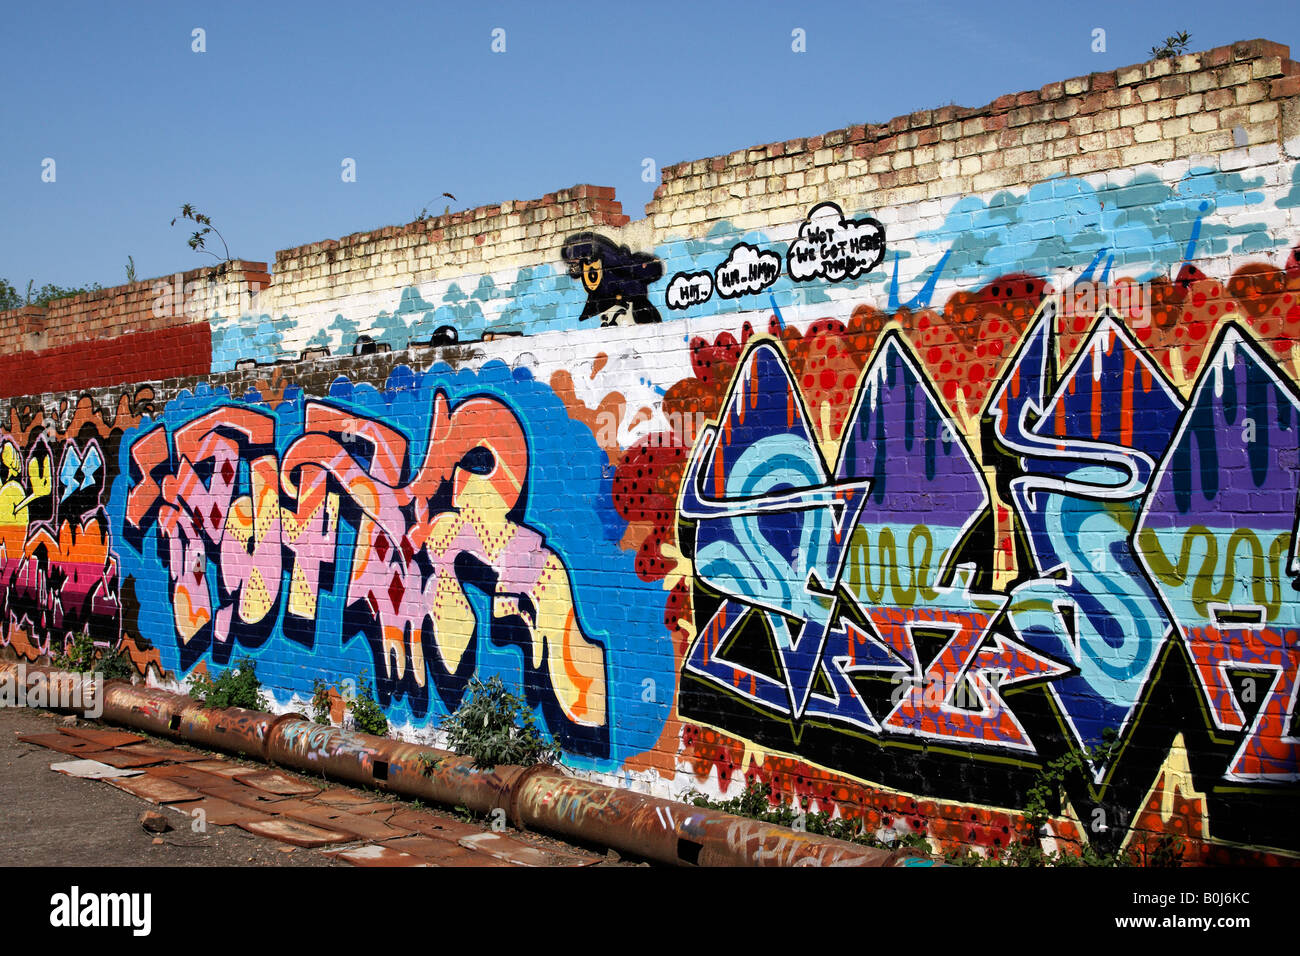 Graffiti wall uk - Graffiti Painted Brick Wall Ewhurst Surrey England Uk Stock Image